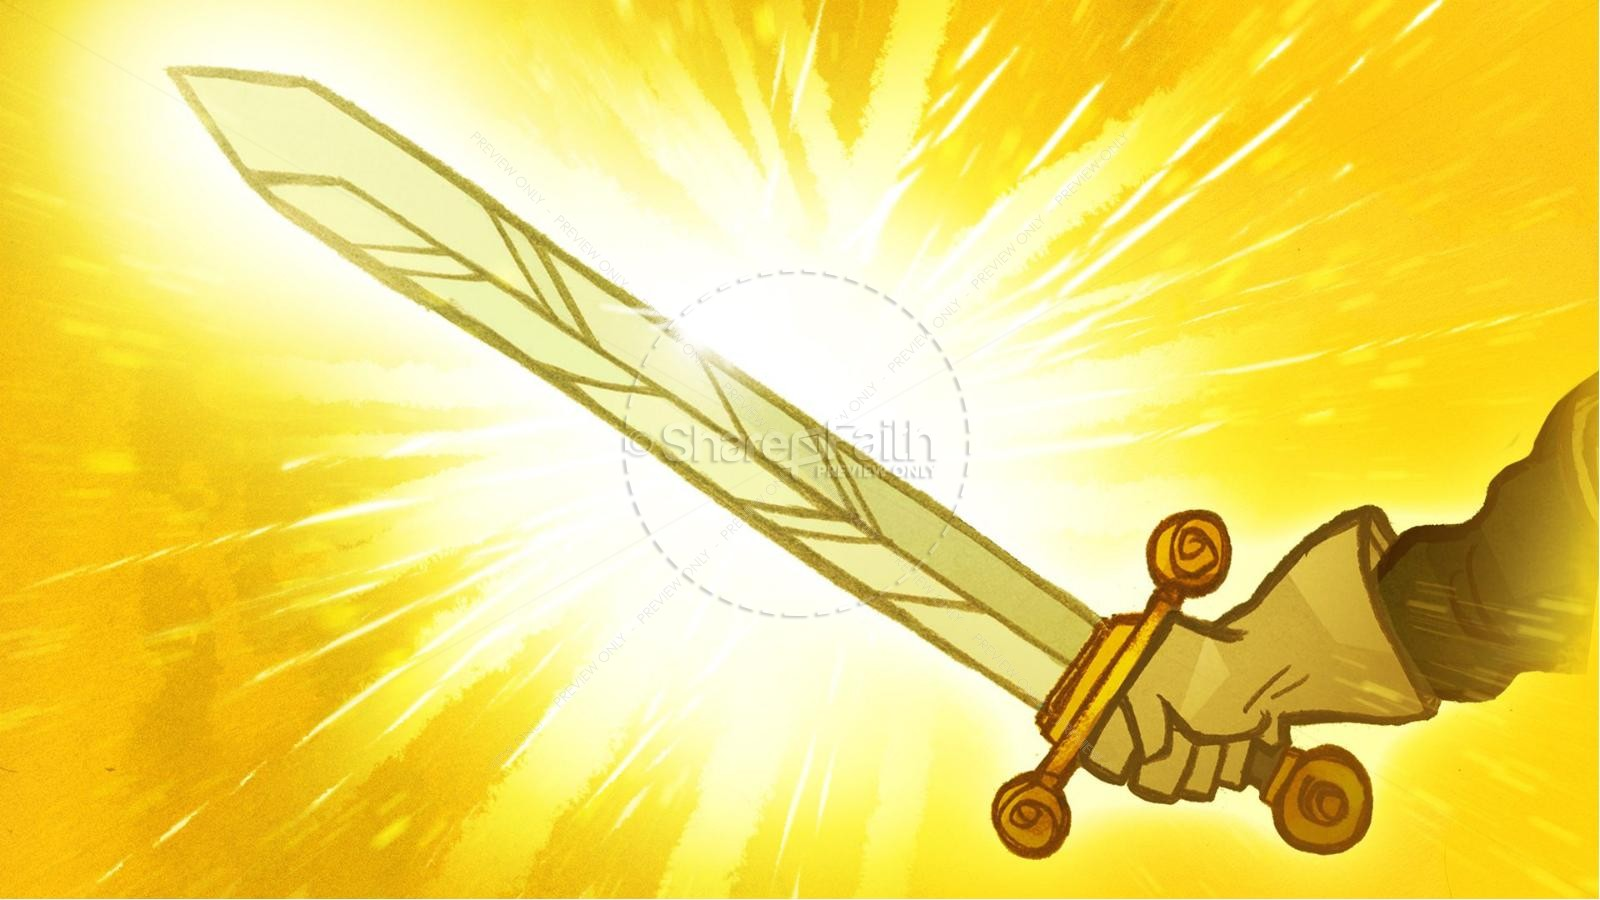 Ephesians 6 The Armor of God Kids Bible Story | slide 9